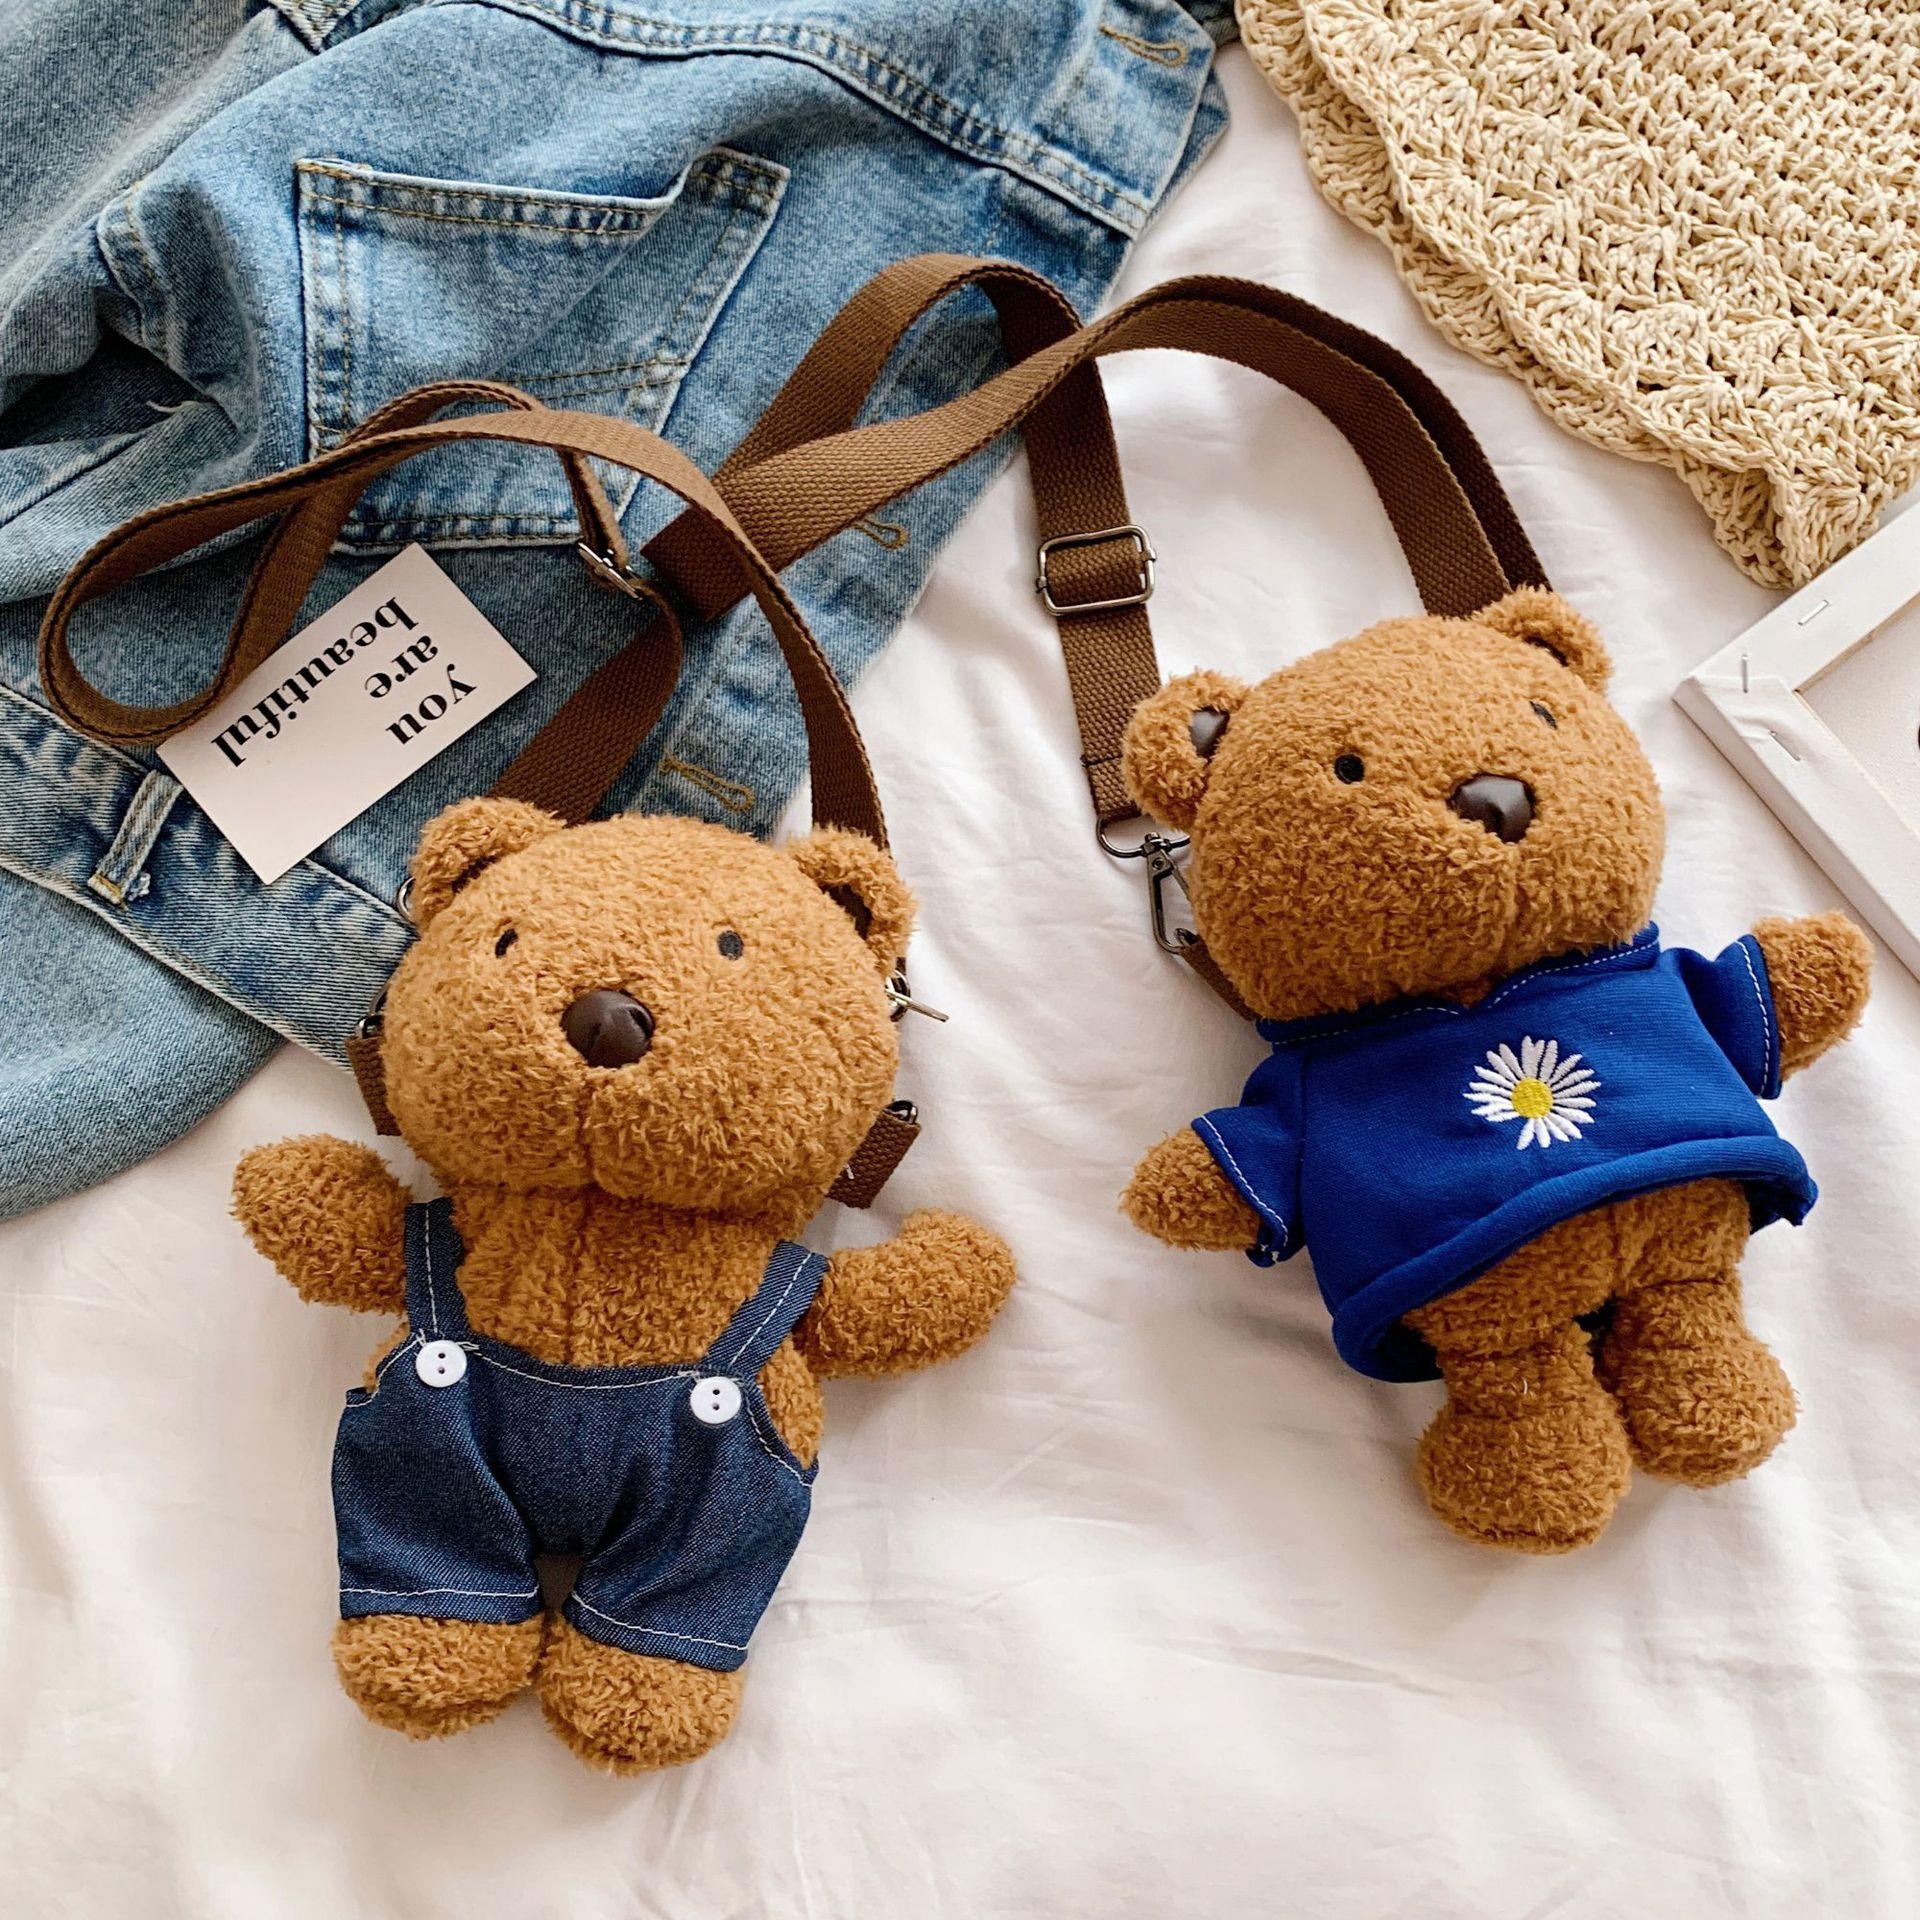 Korean-Style Cute Bear Bag 2020 New Style Stuffed Toy Women's Bag Cartoon Shoulder Bag Messenger Bag Phone Bag